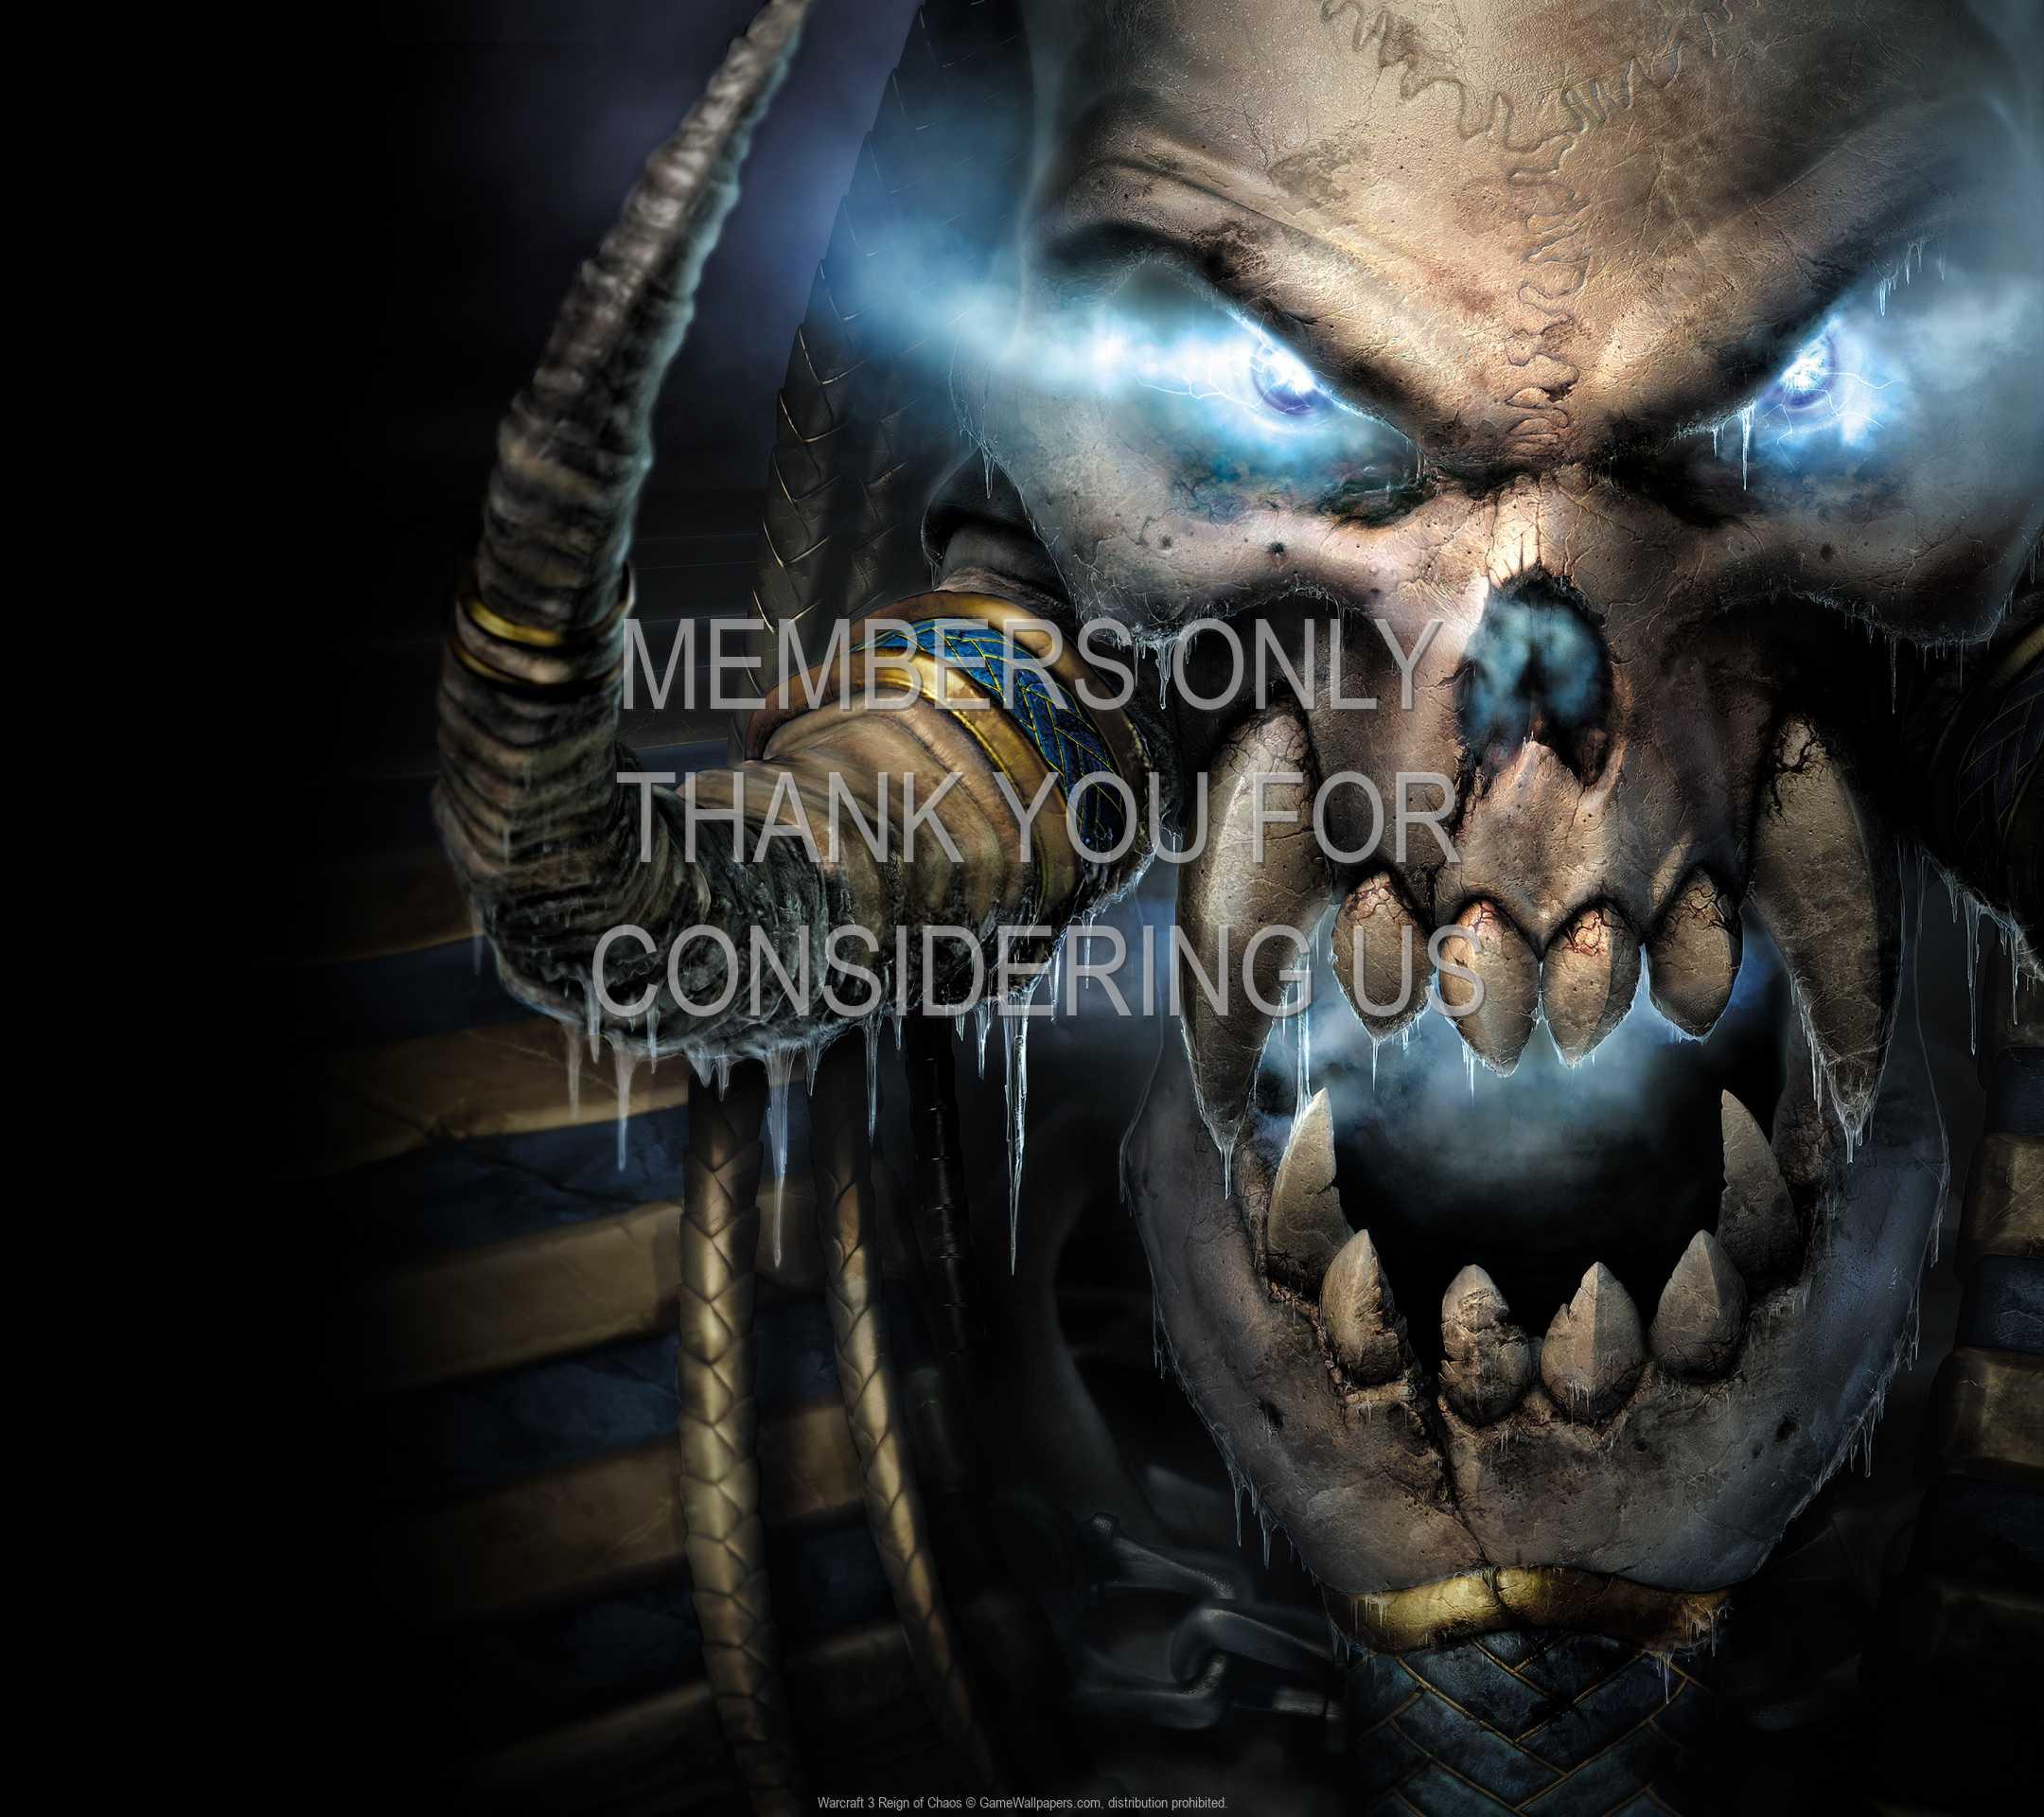 Warcraft 3: Reign of Chaos 1080p Horizontal Handy Hintergrundbild 26